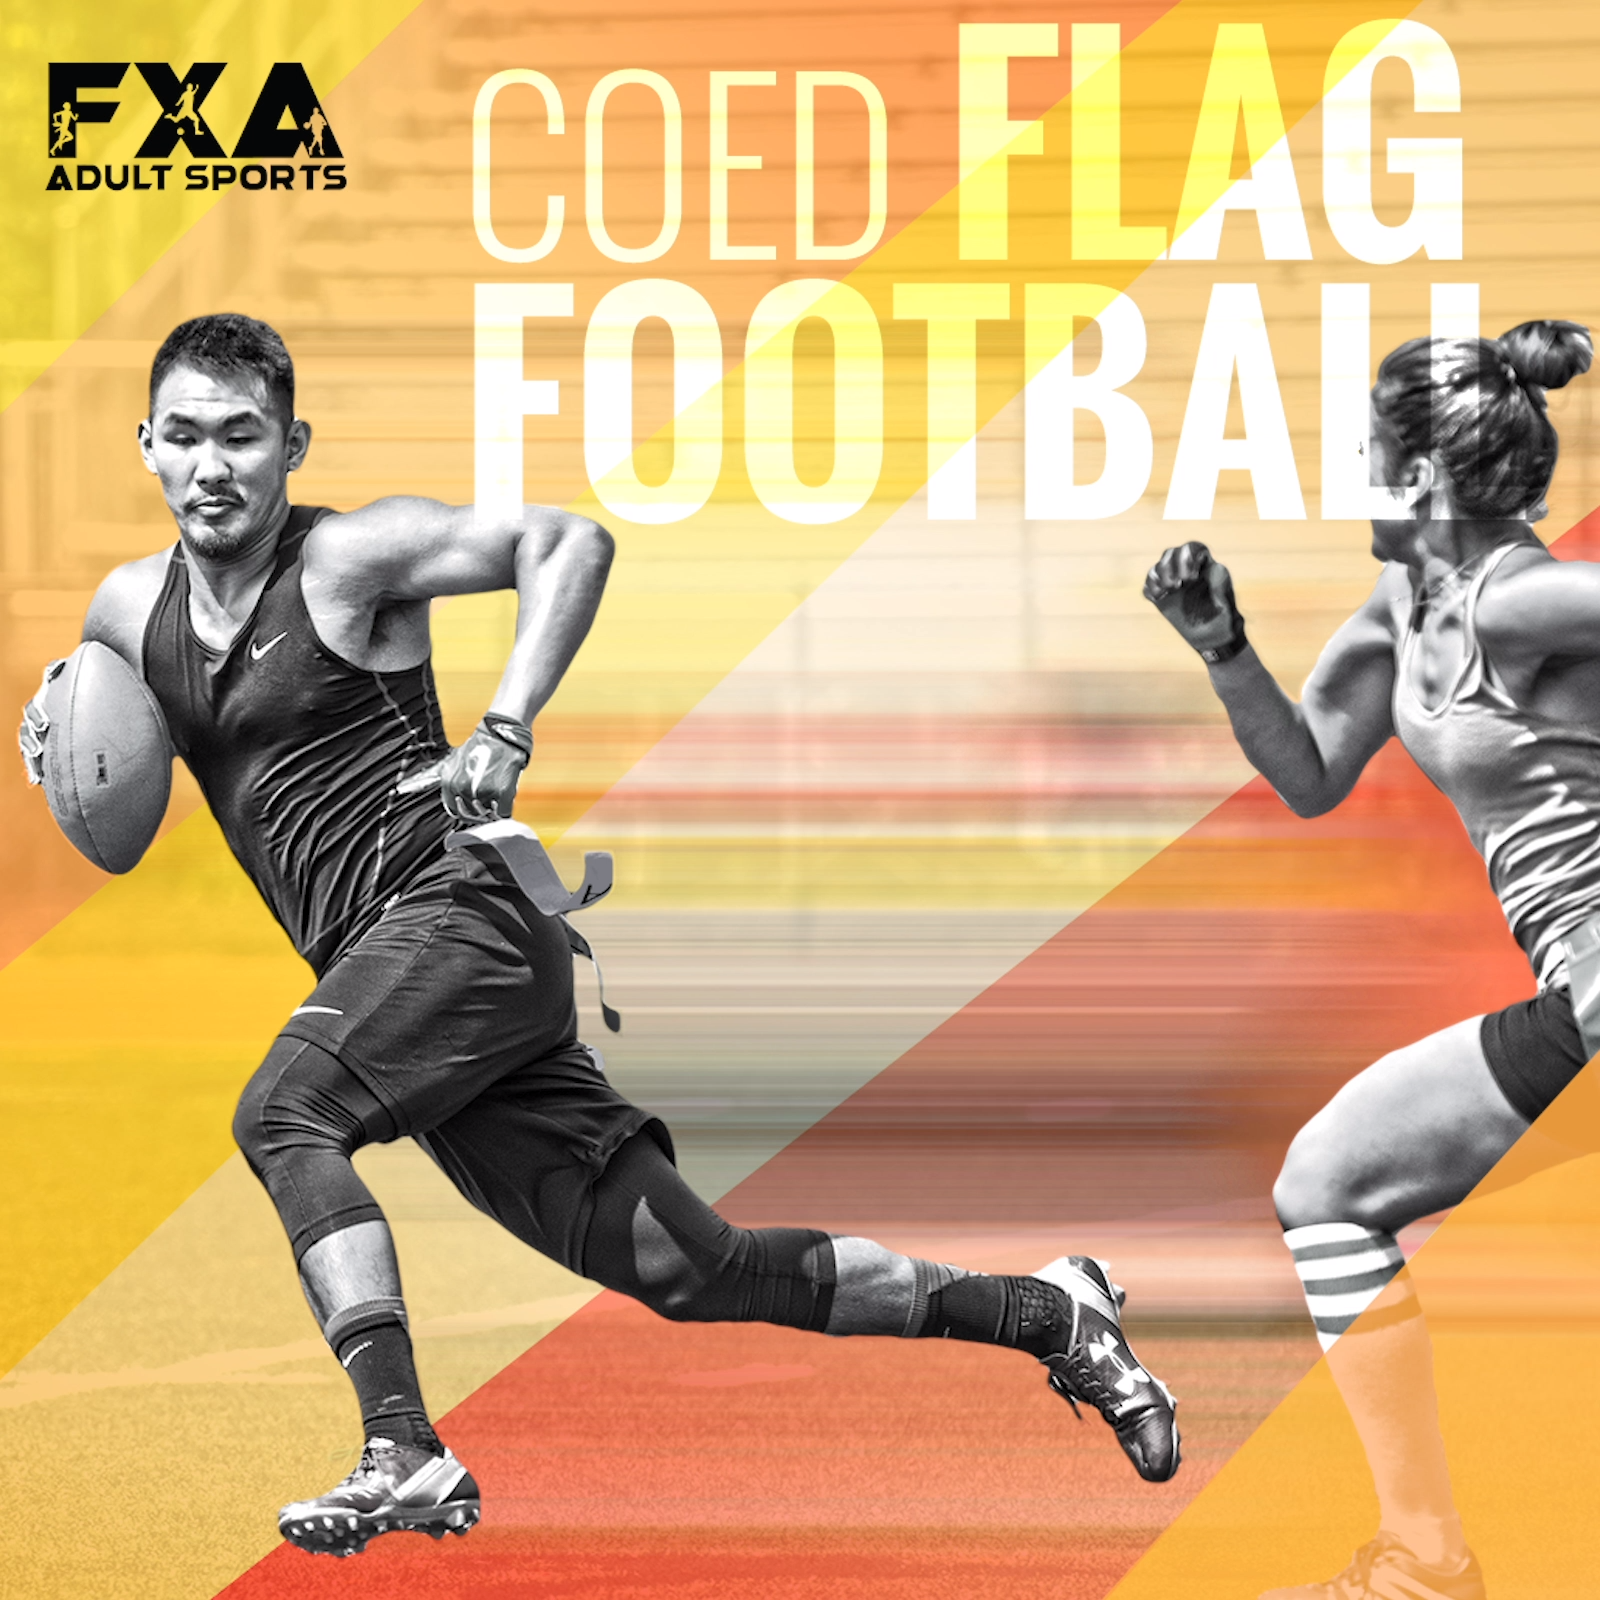 Fxa Sports Co Ed Flag Football Video Flag Football Flag Football League Football